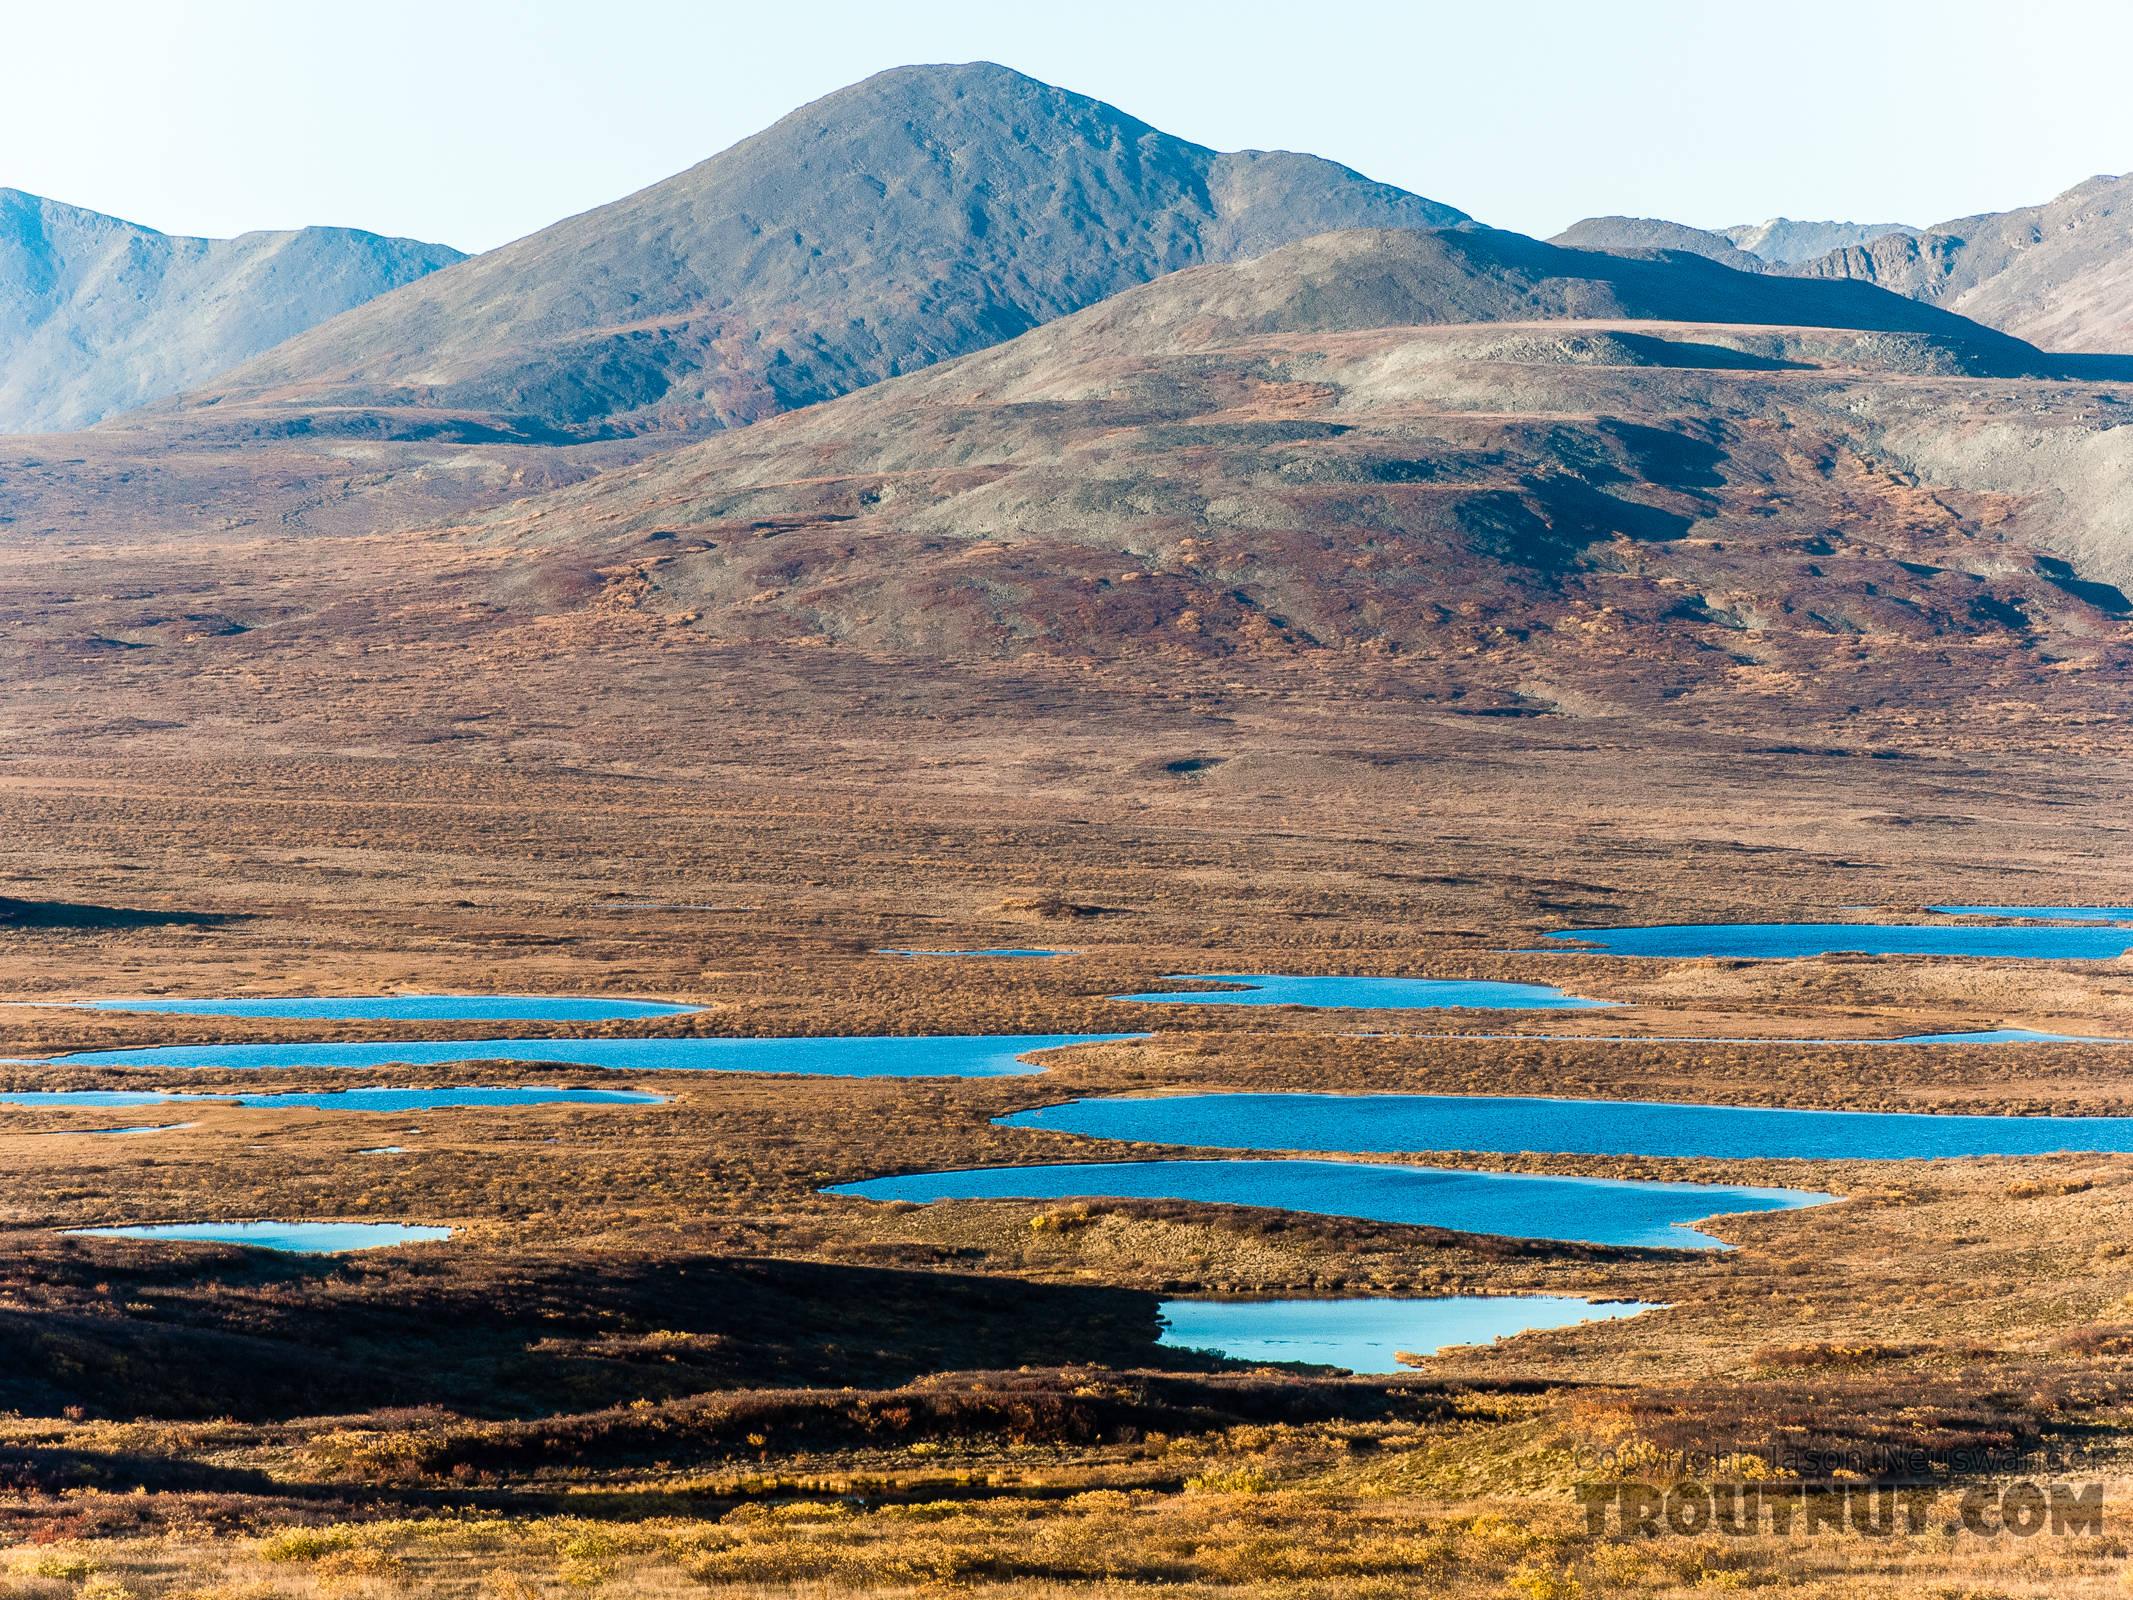 Kettle lakes From Denali Highway in Alaska.